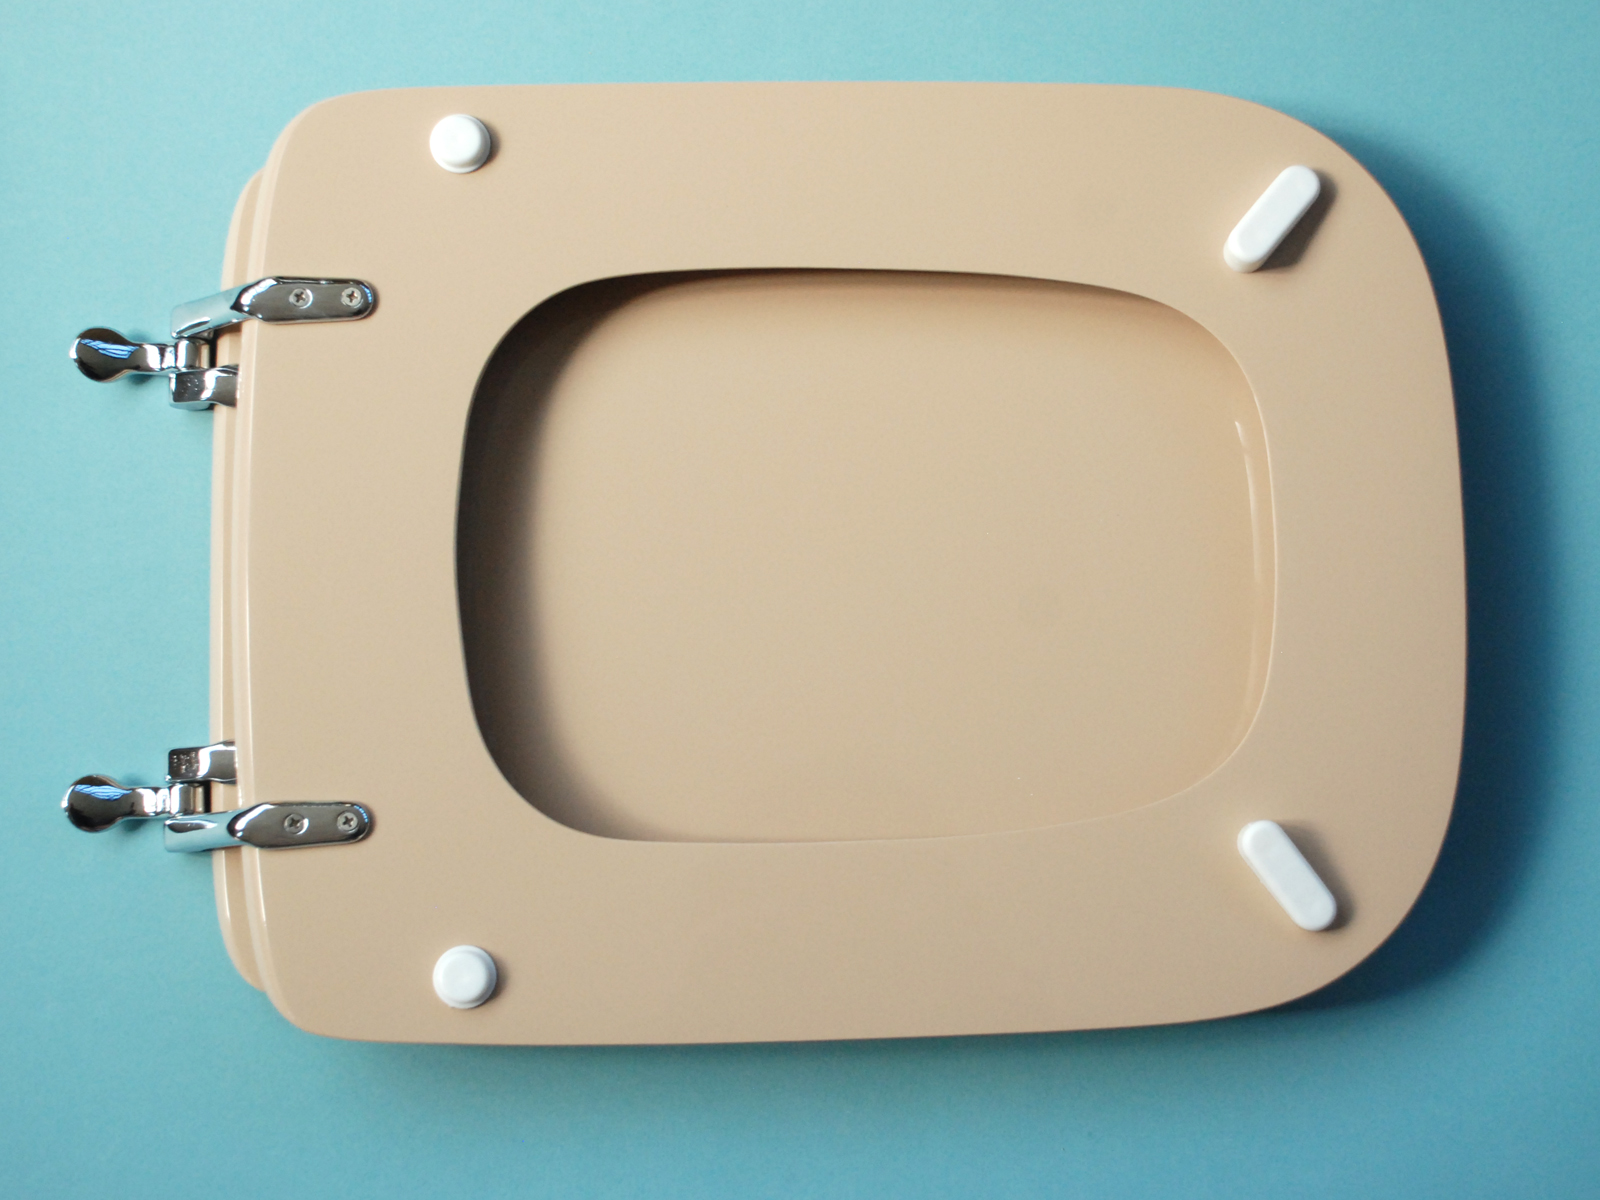 Sedile Water Ideal Standard Modello Conca.Sedile Wc Conca Colorato Ideal Standard Serie Conca Avec Sedile